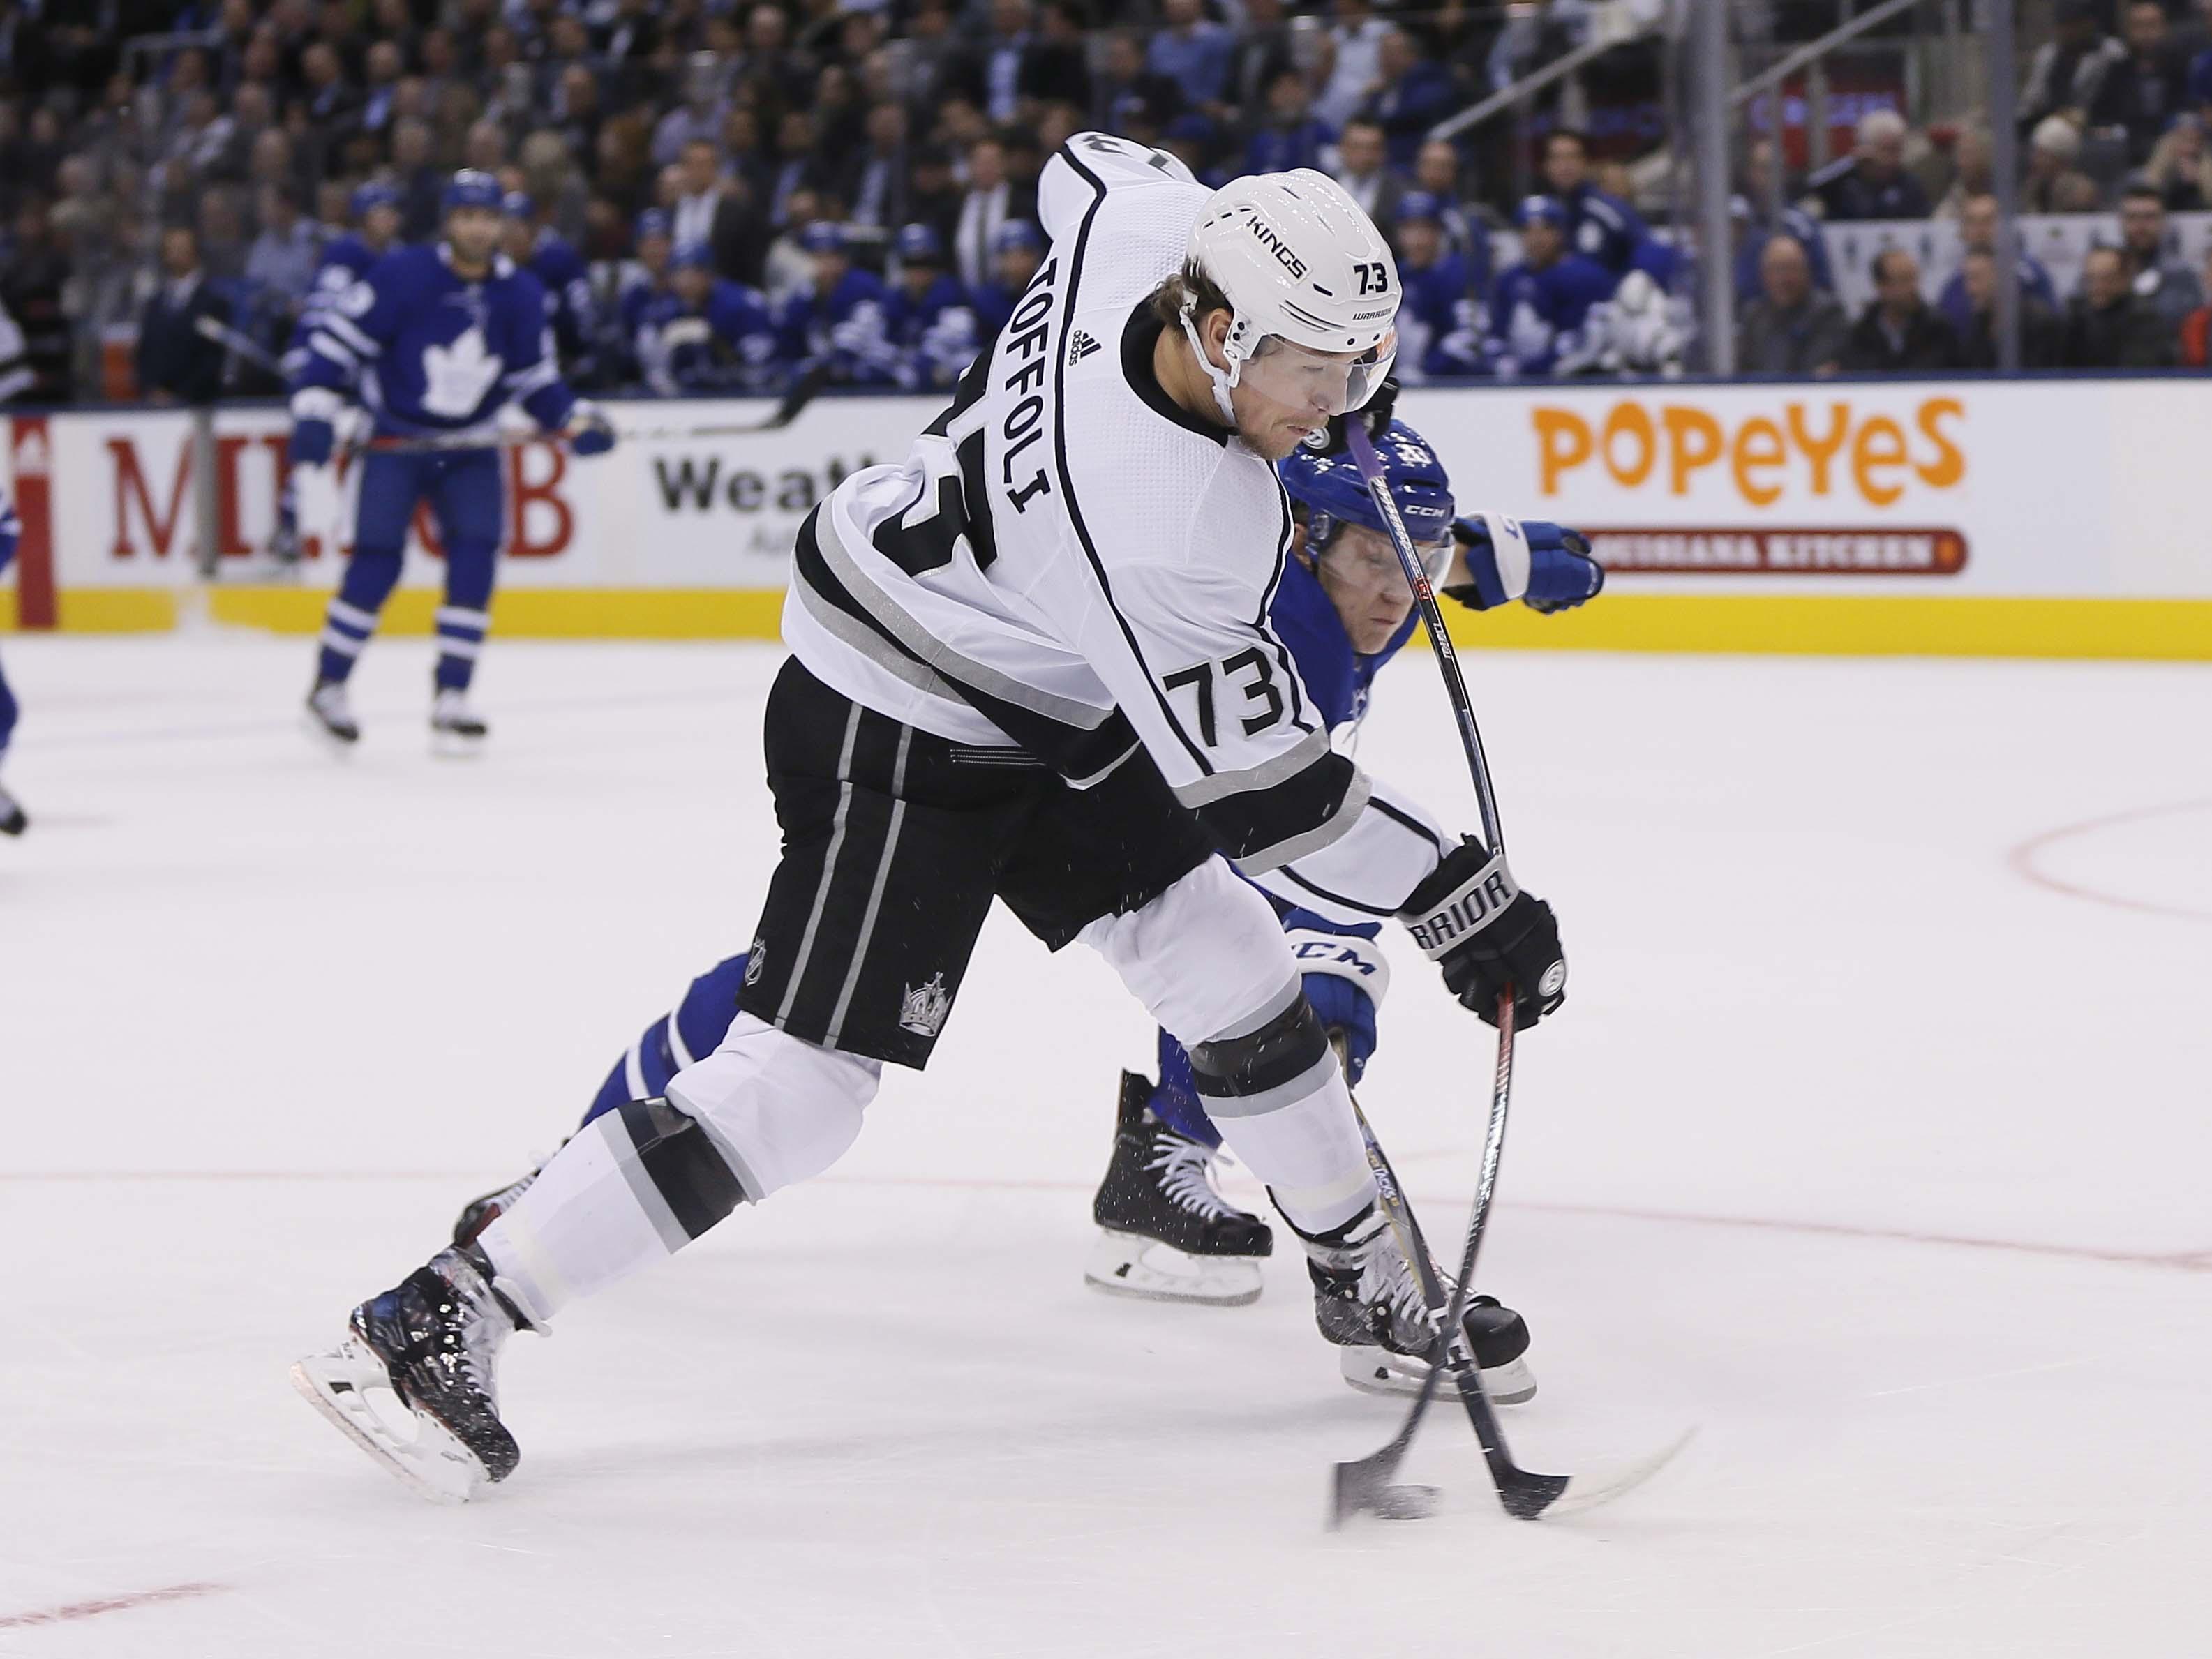 NHL: Los Angeles Kings at Toronto Maple Leafs